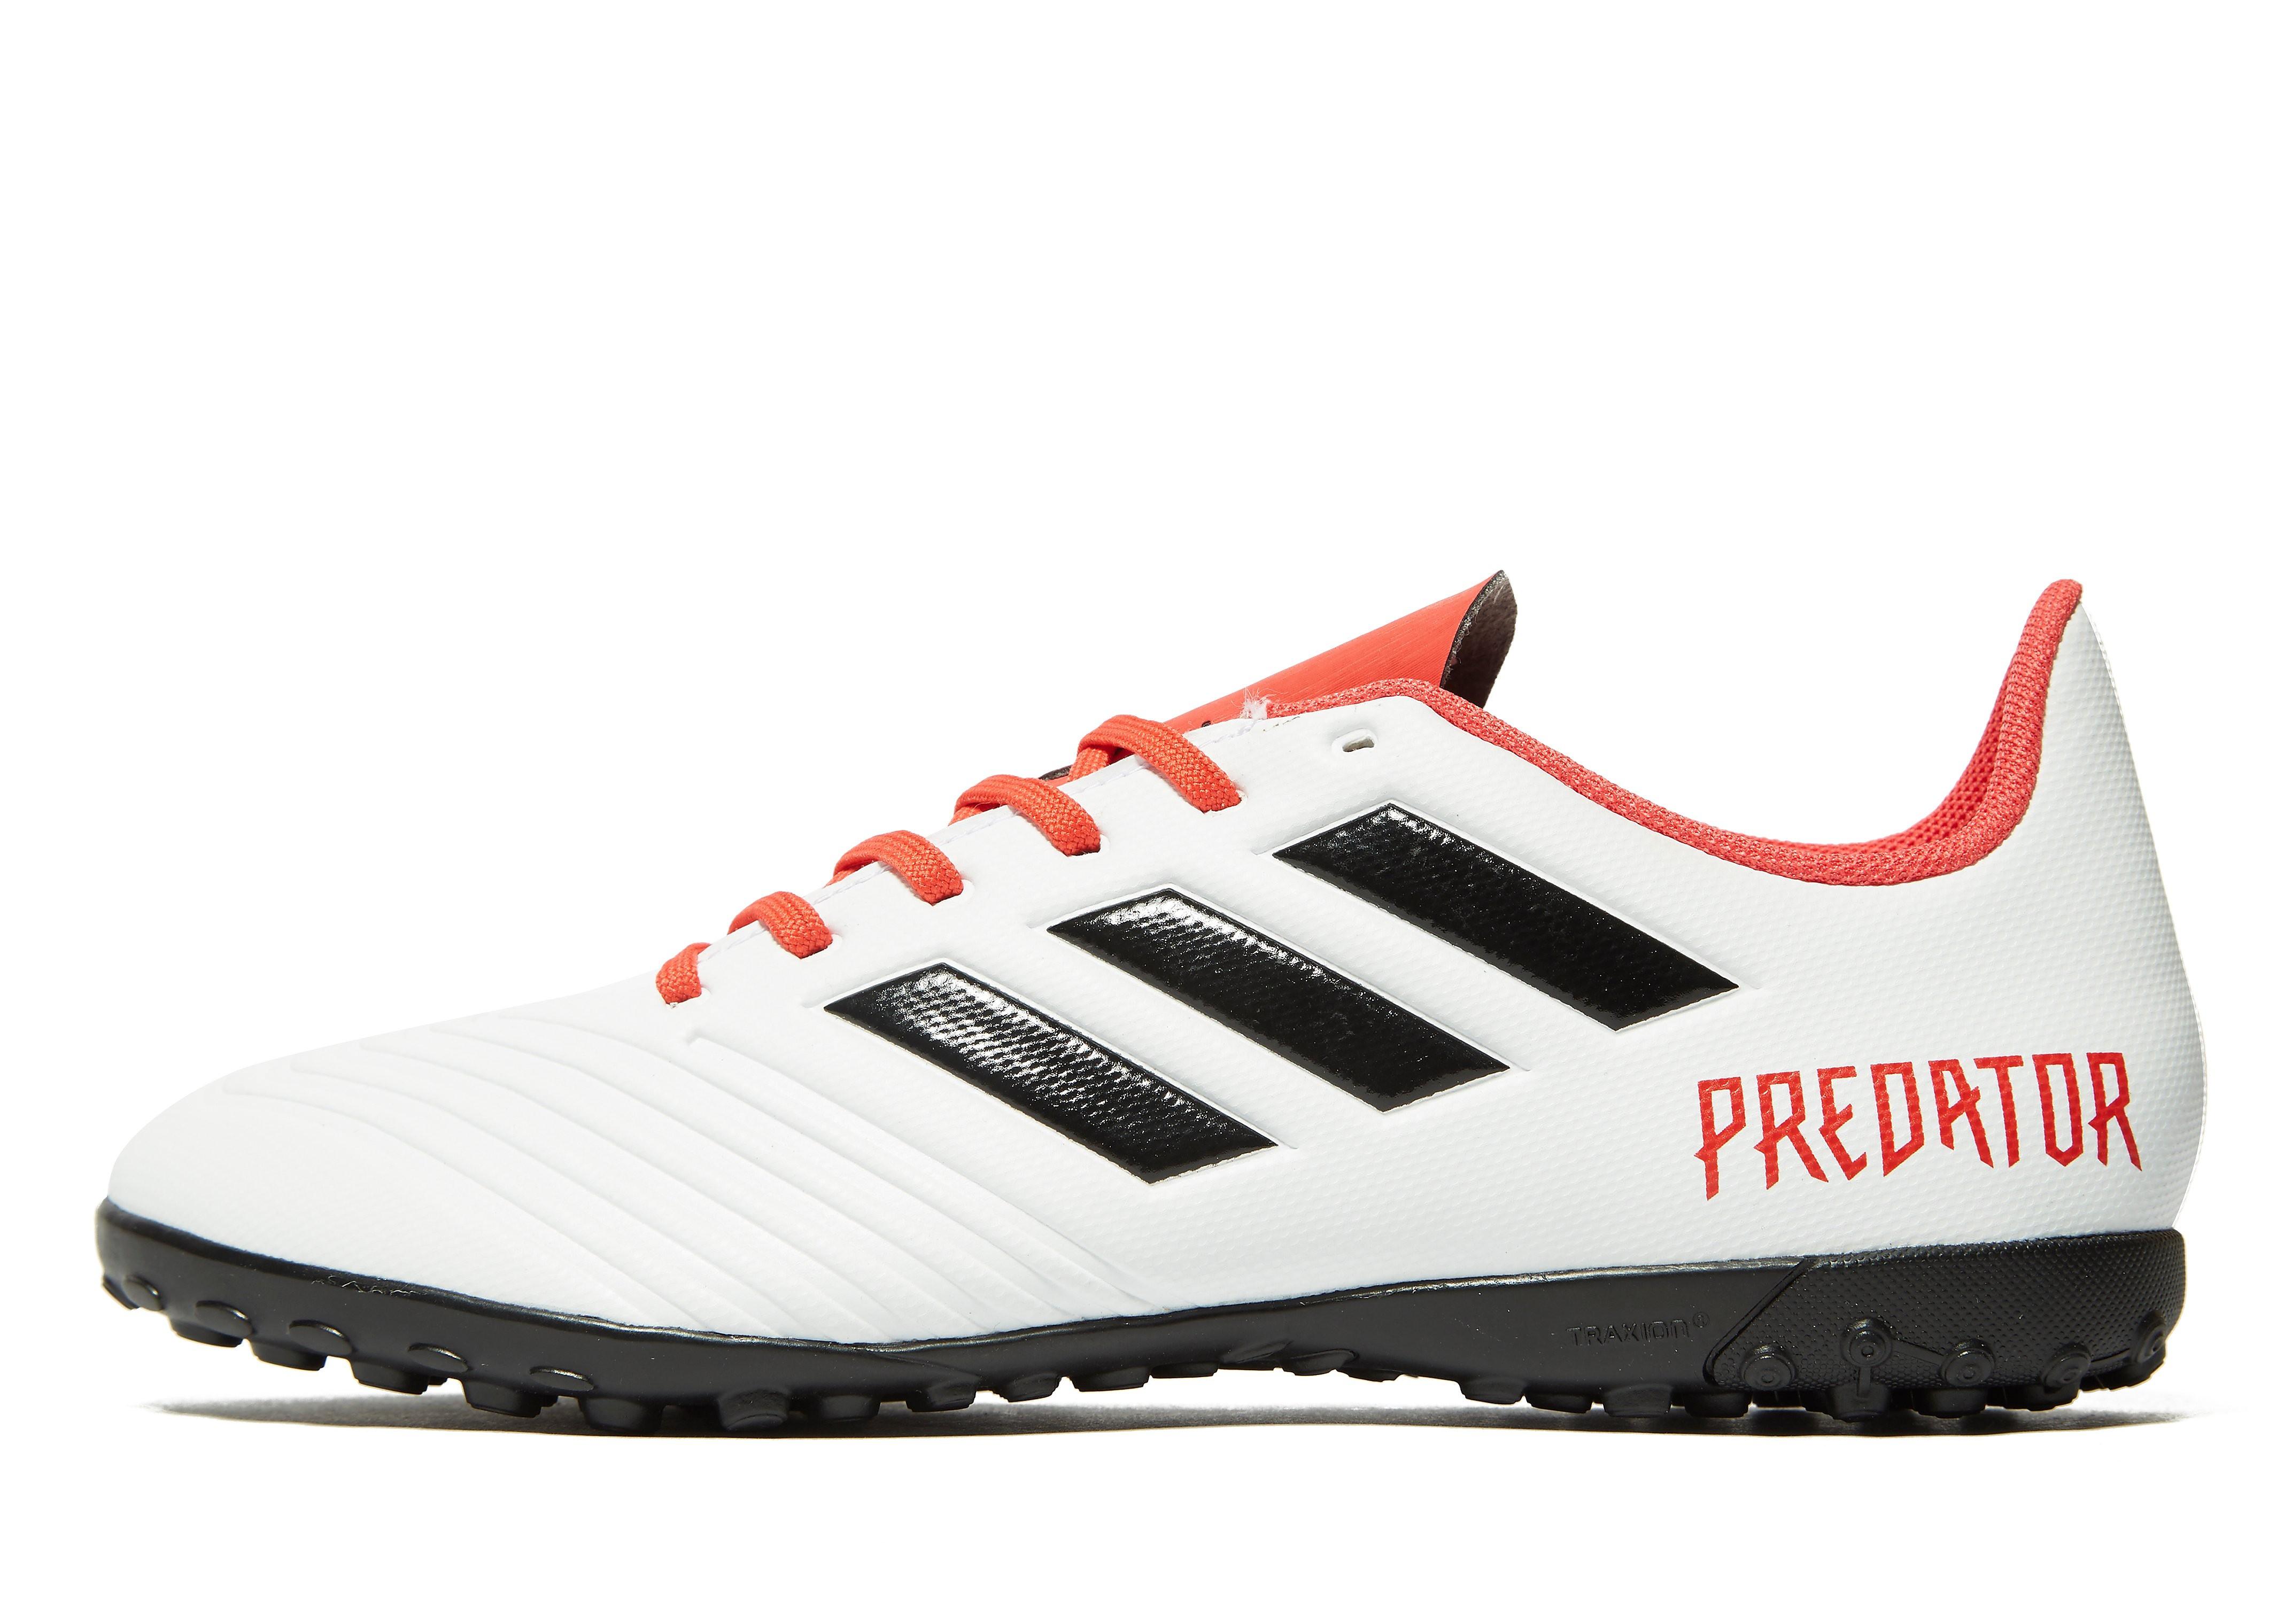 adidas Cold Blooded Predator 18.4 TF